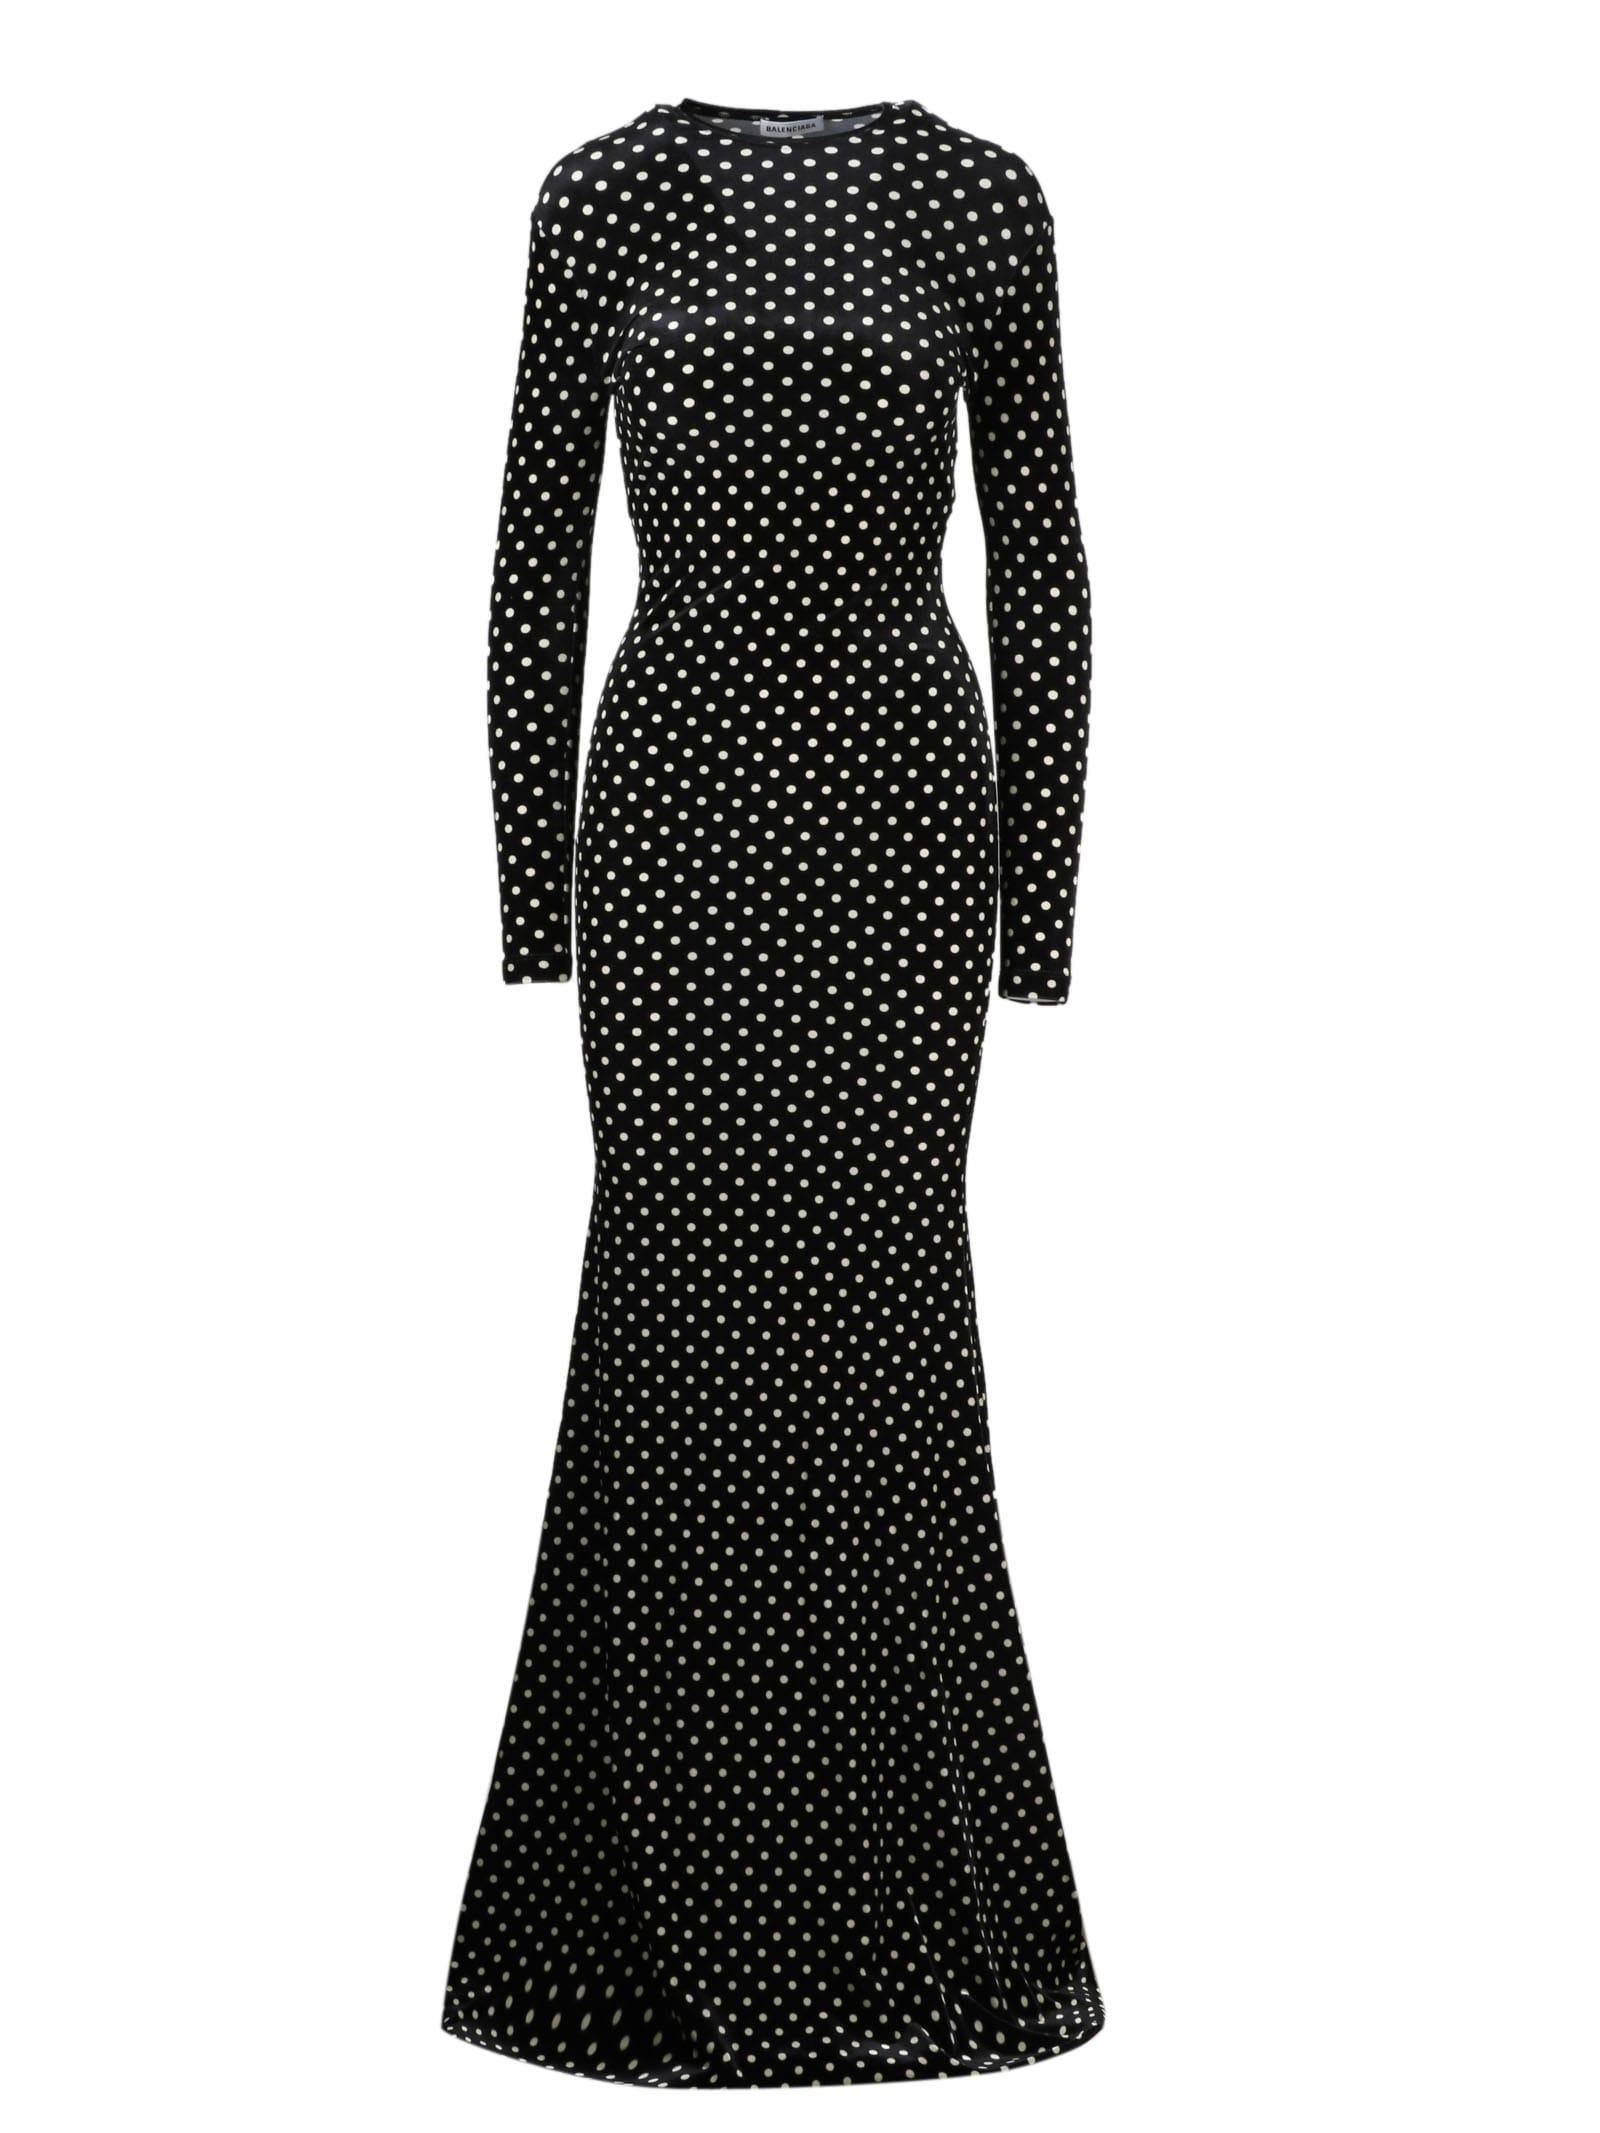 detailed look 100% genuine reasonably priced Balenciaga Dress